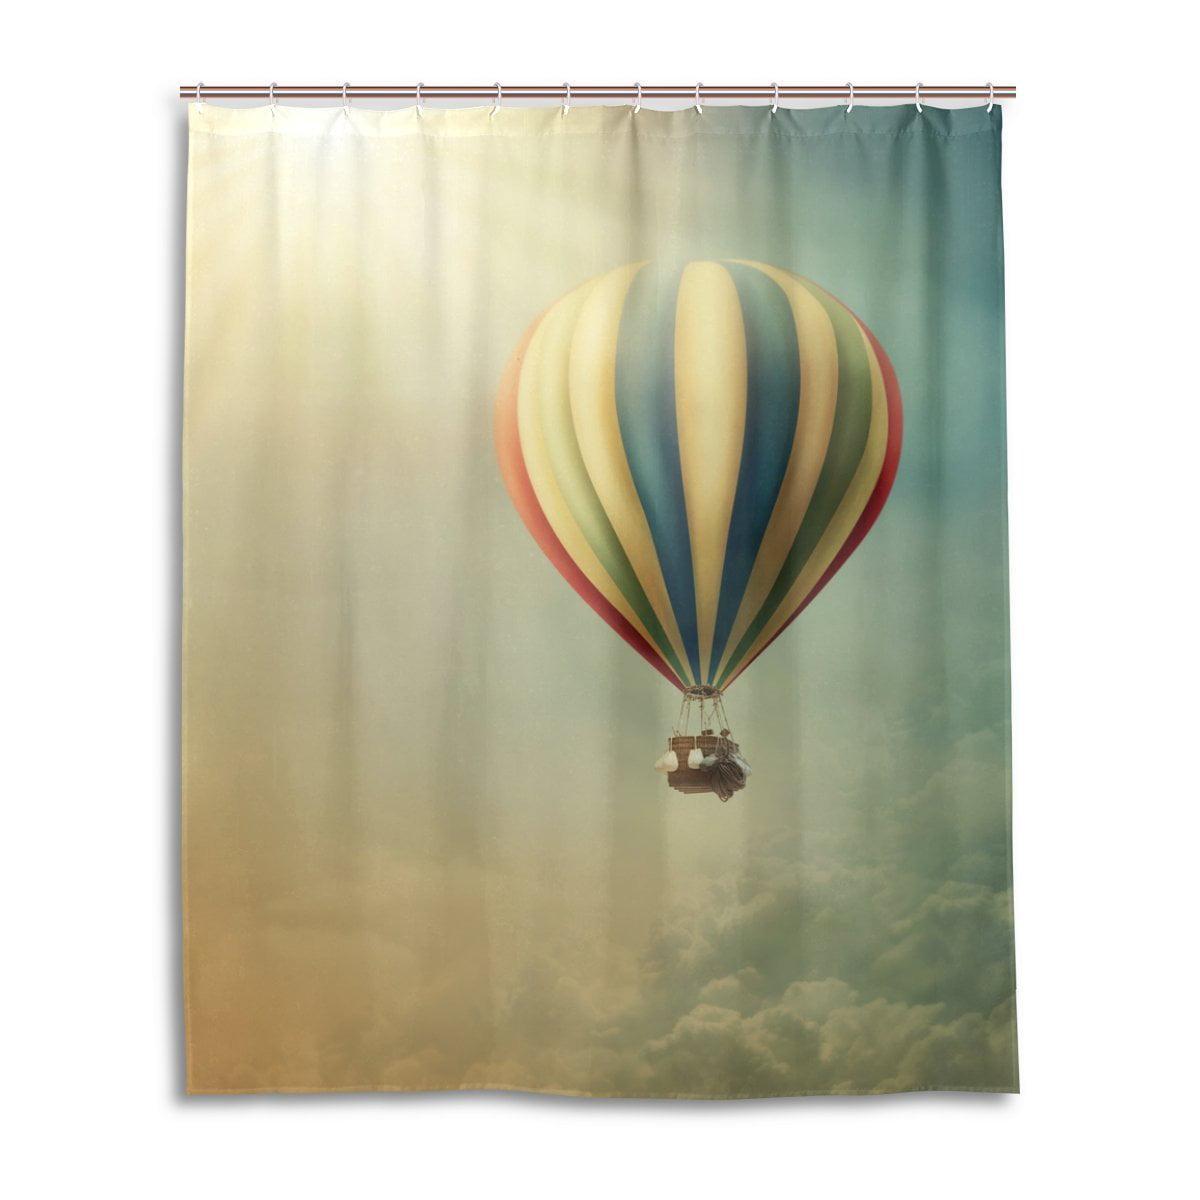 Popcreation Bathroom Hot Air Balloon, Hot Air Balloon Bathroom Decor